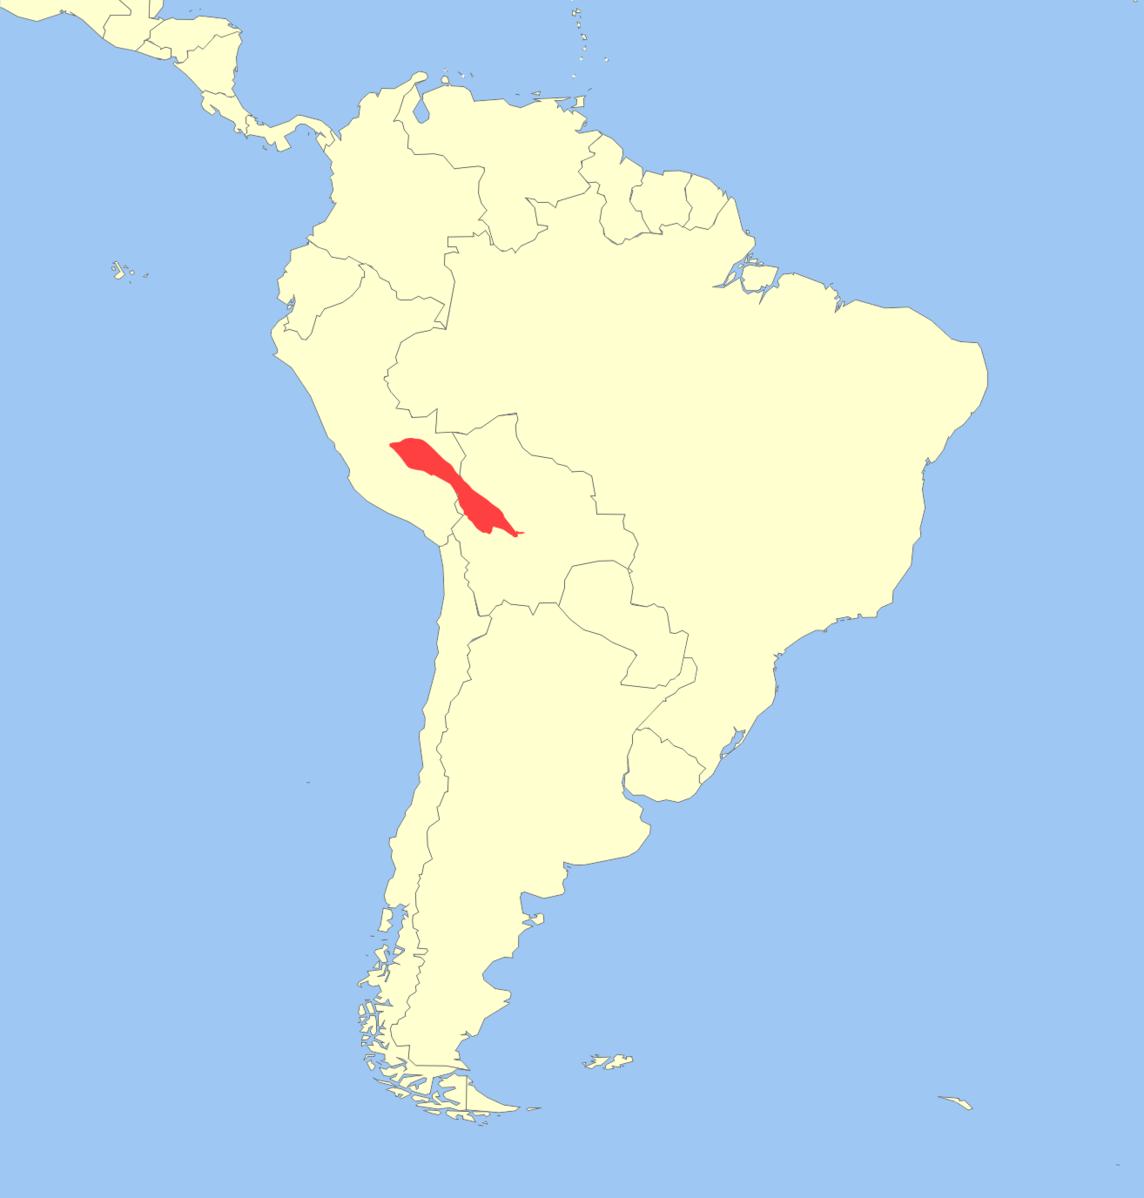 stromausfall südamerika - HD1144×1198